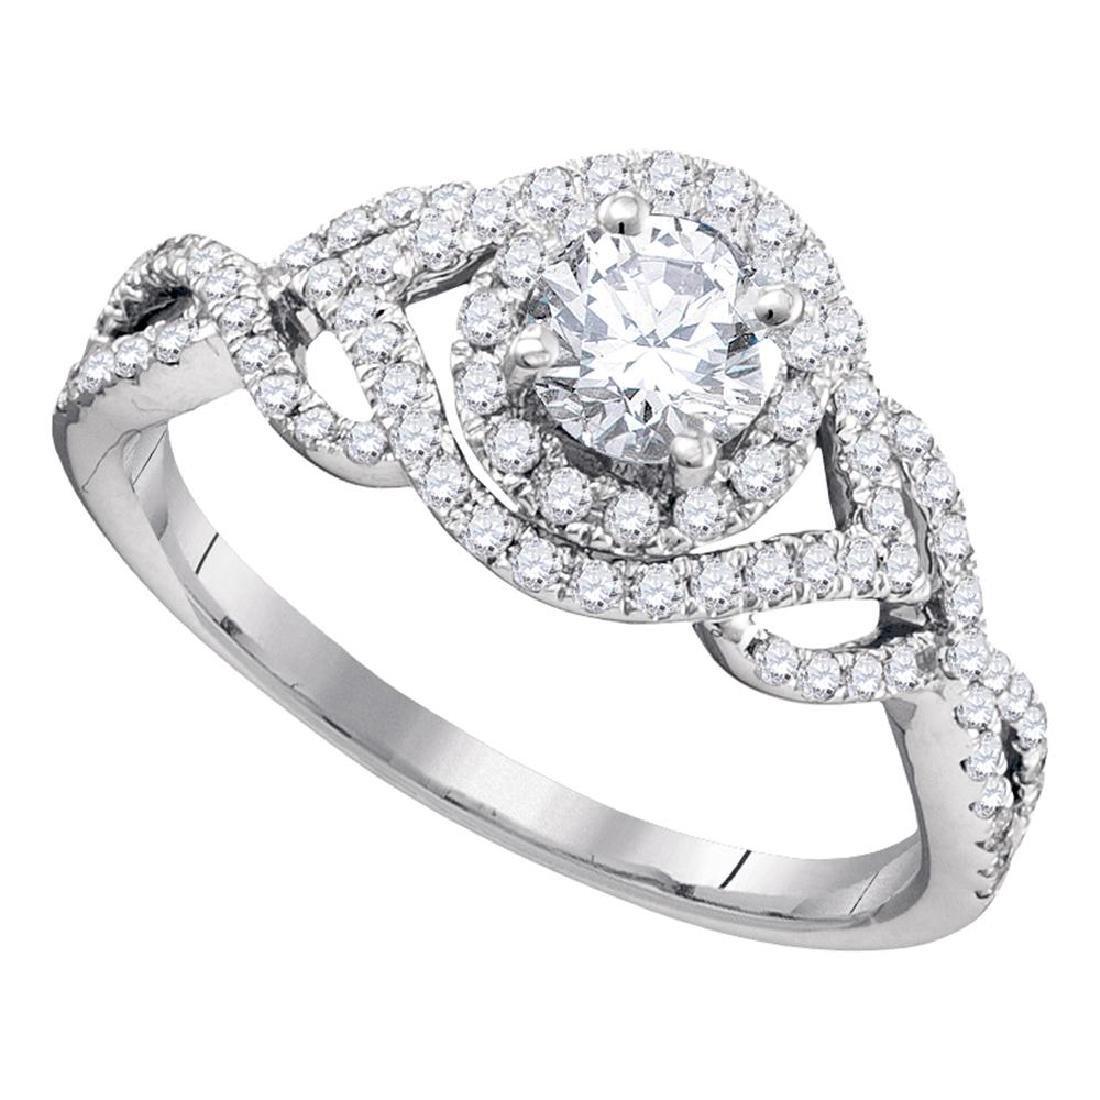 0.88 CTW Diamond Solitaire Bridal Engagement Ring 14KT